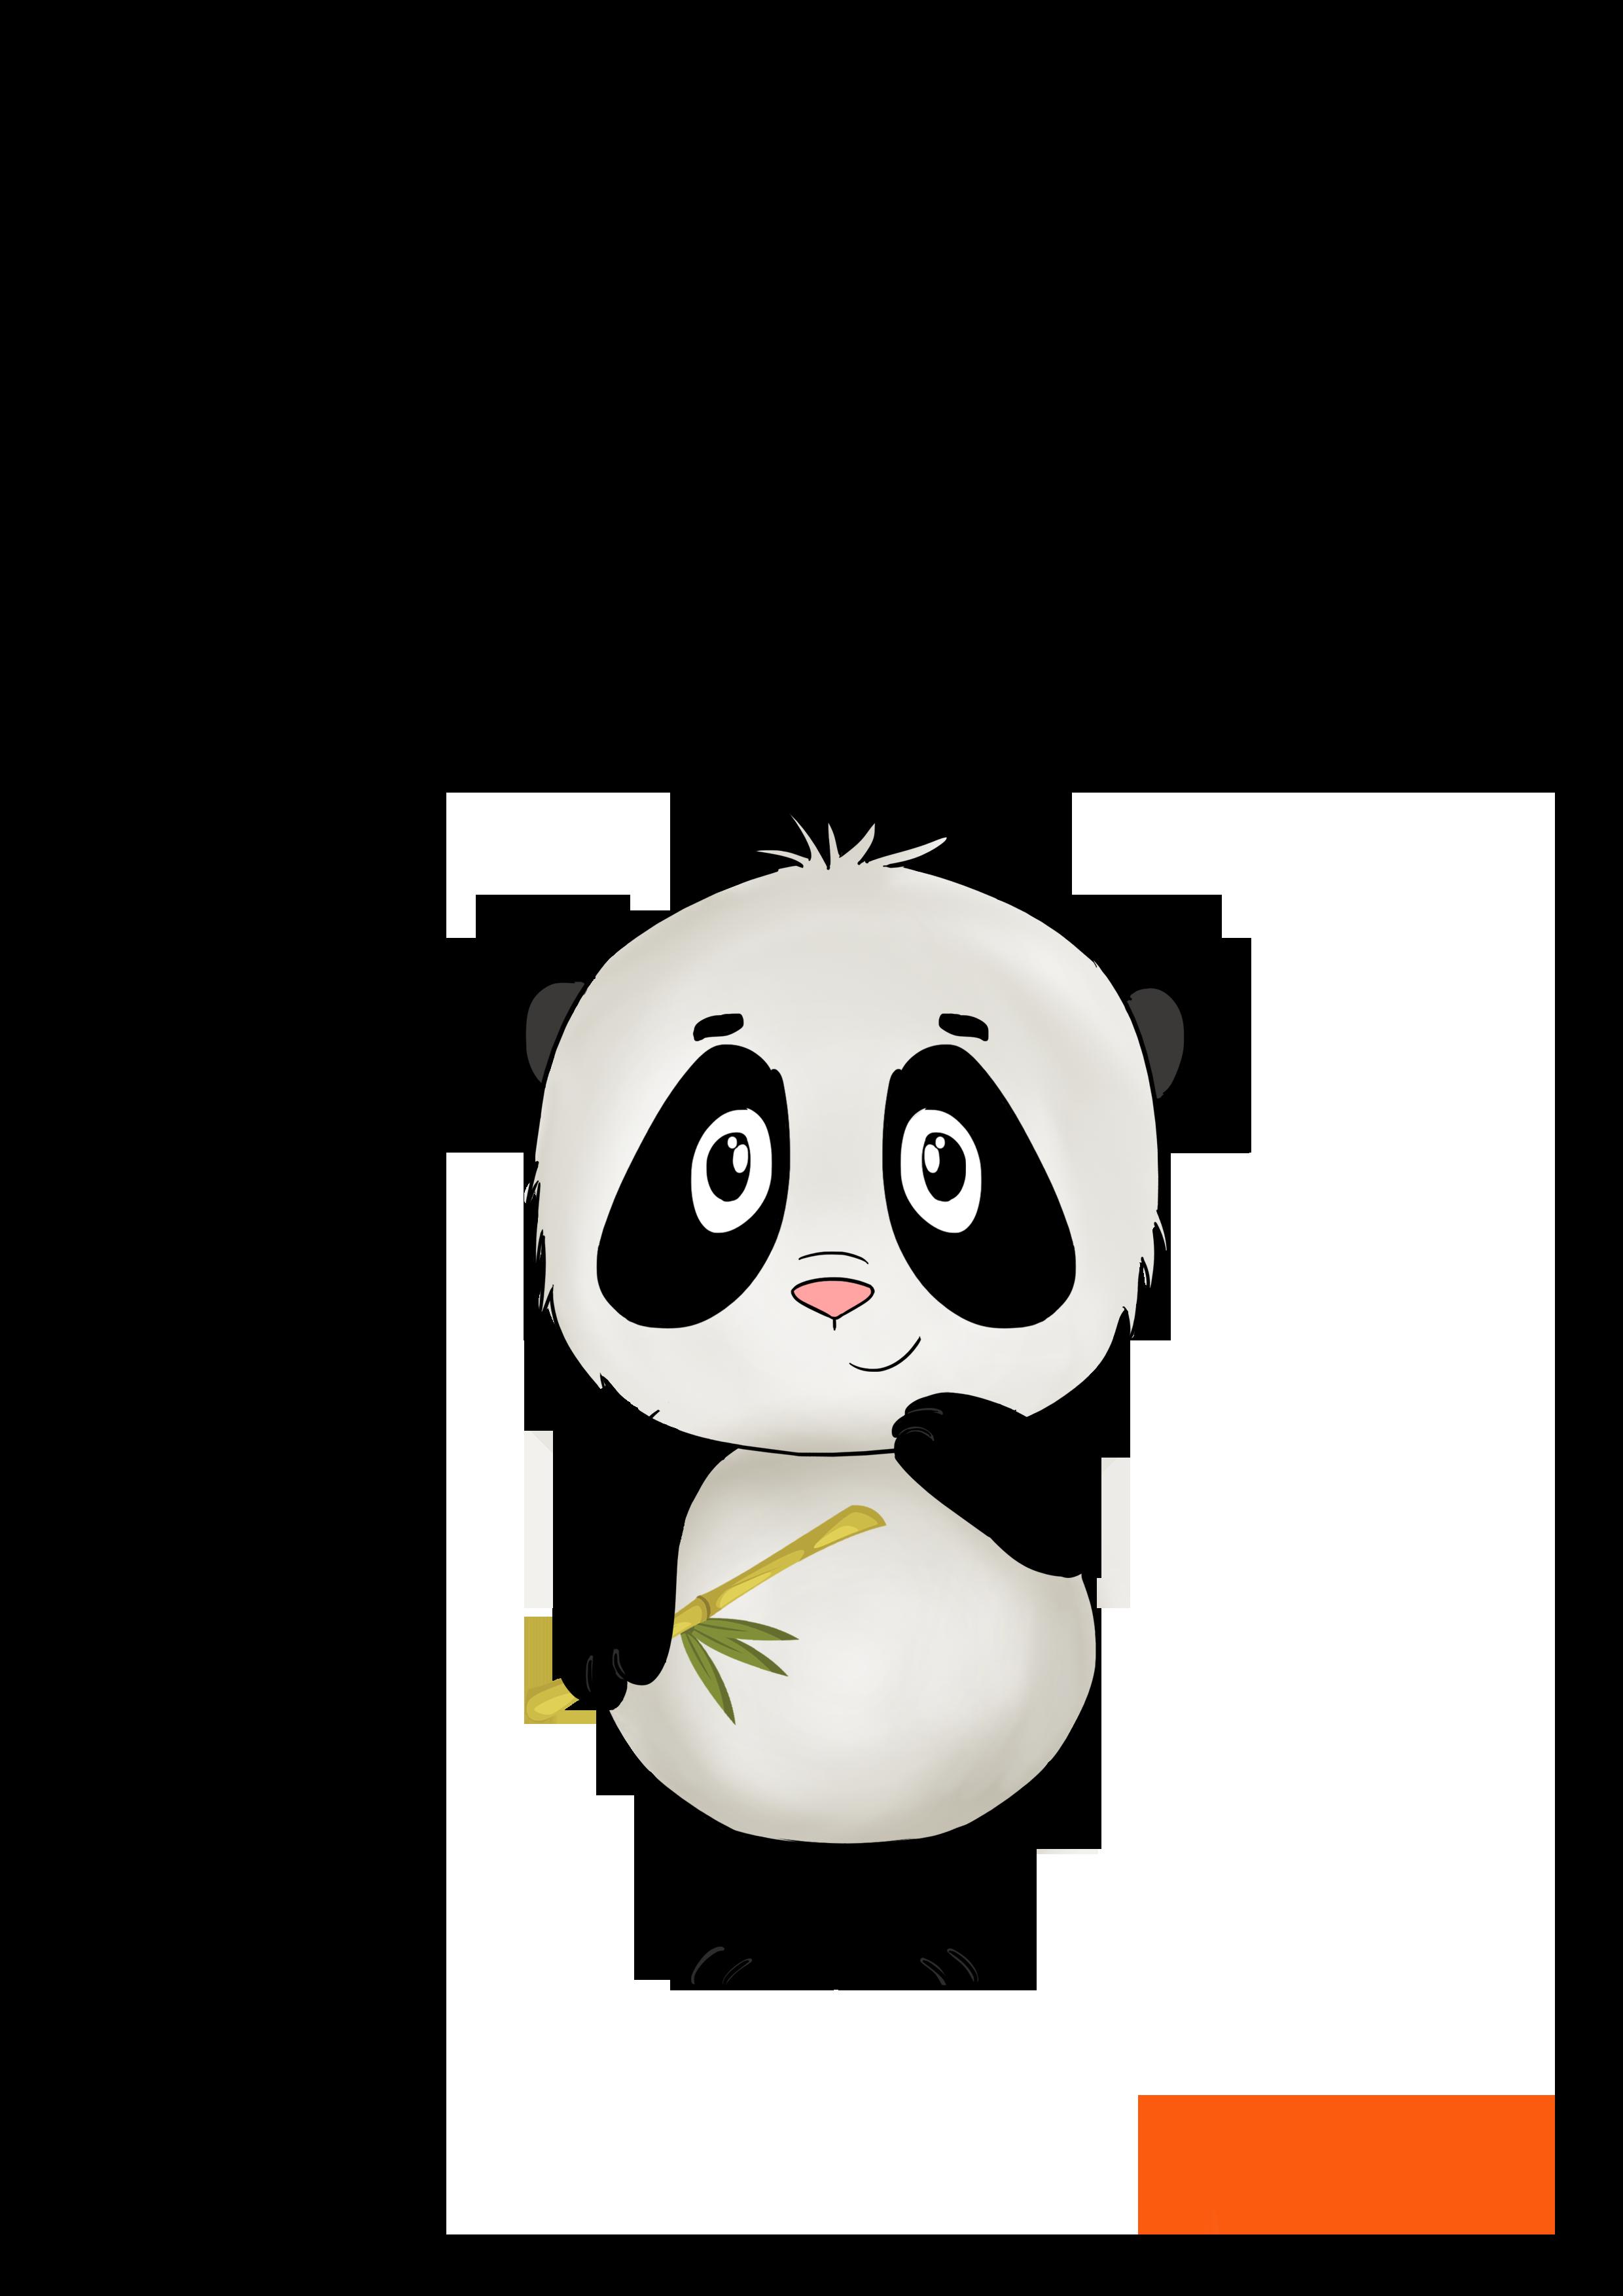 How to draw a cute Panda?